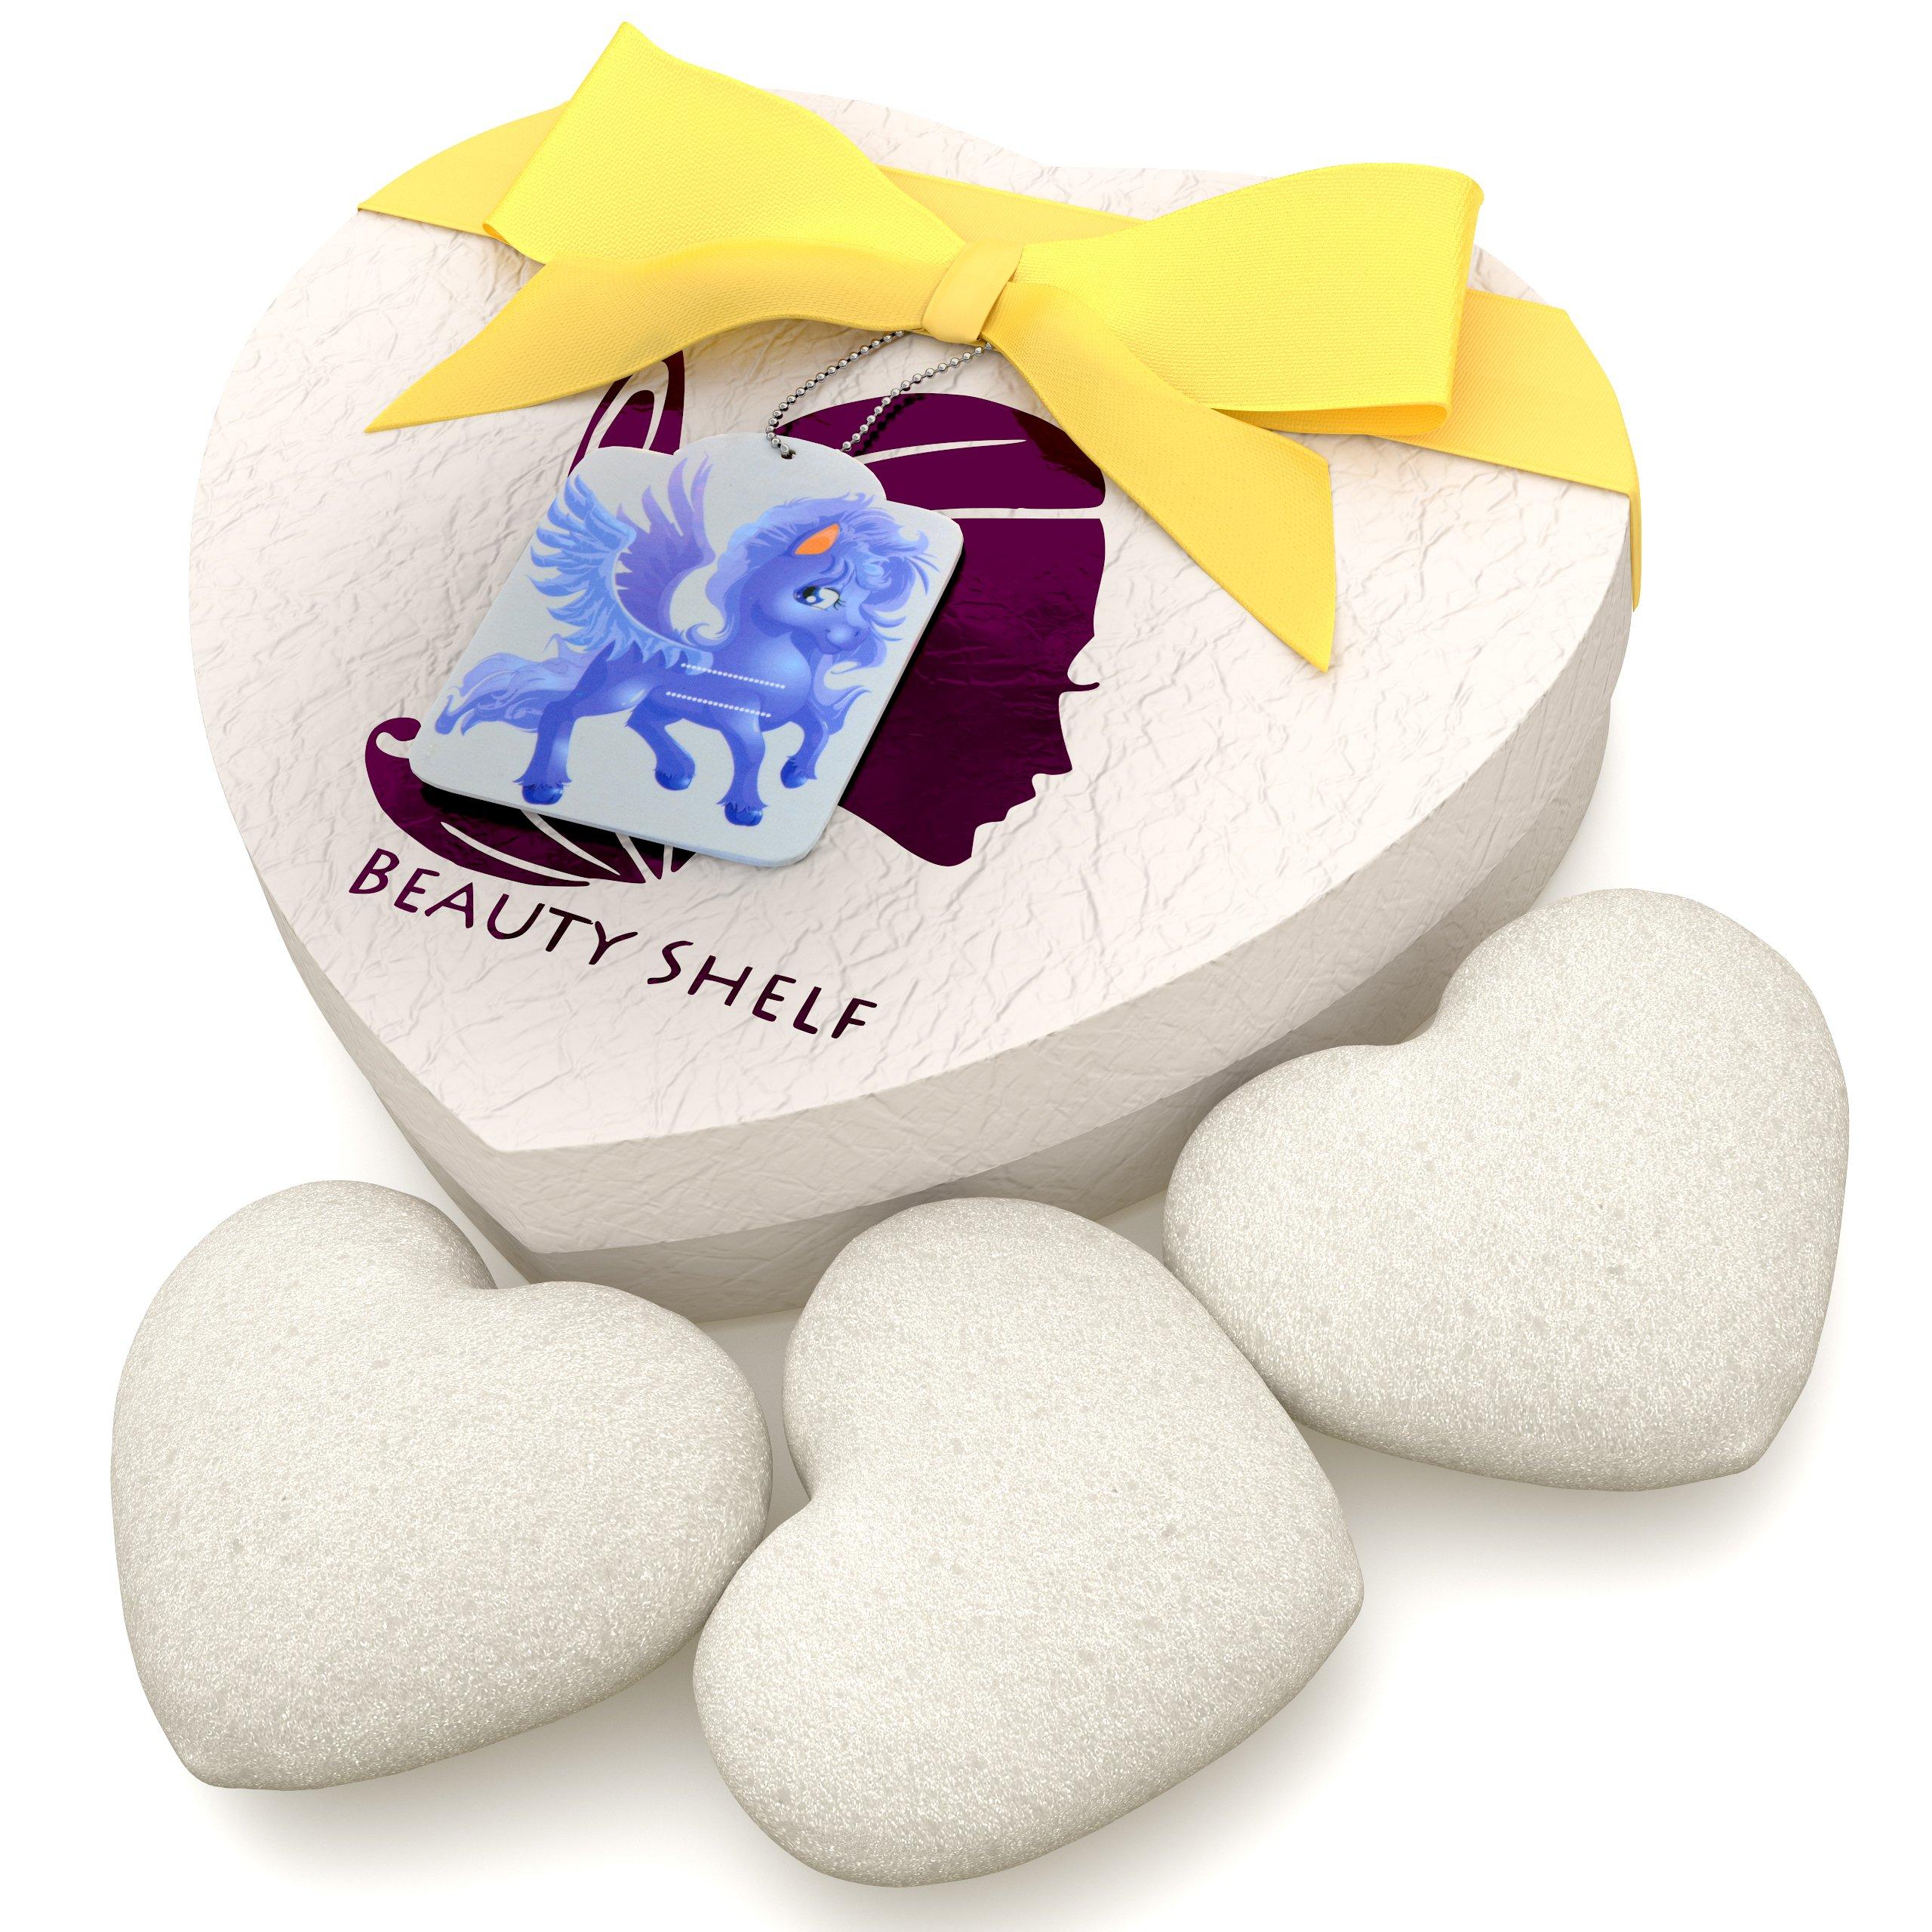 Konjac Sponge (3 Pack) - Natural White Sponges for Babies and Sensitive Facial Skin